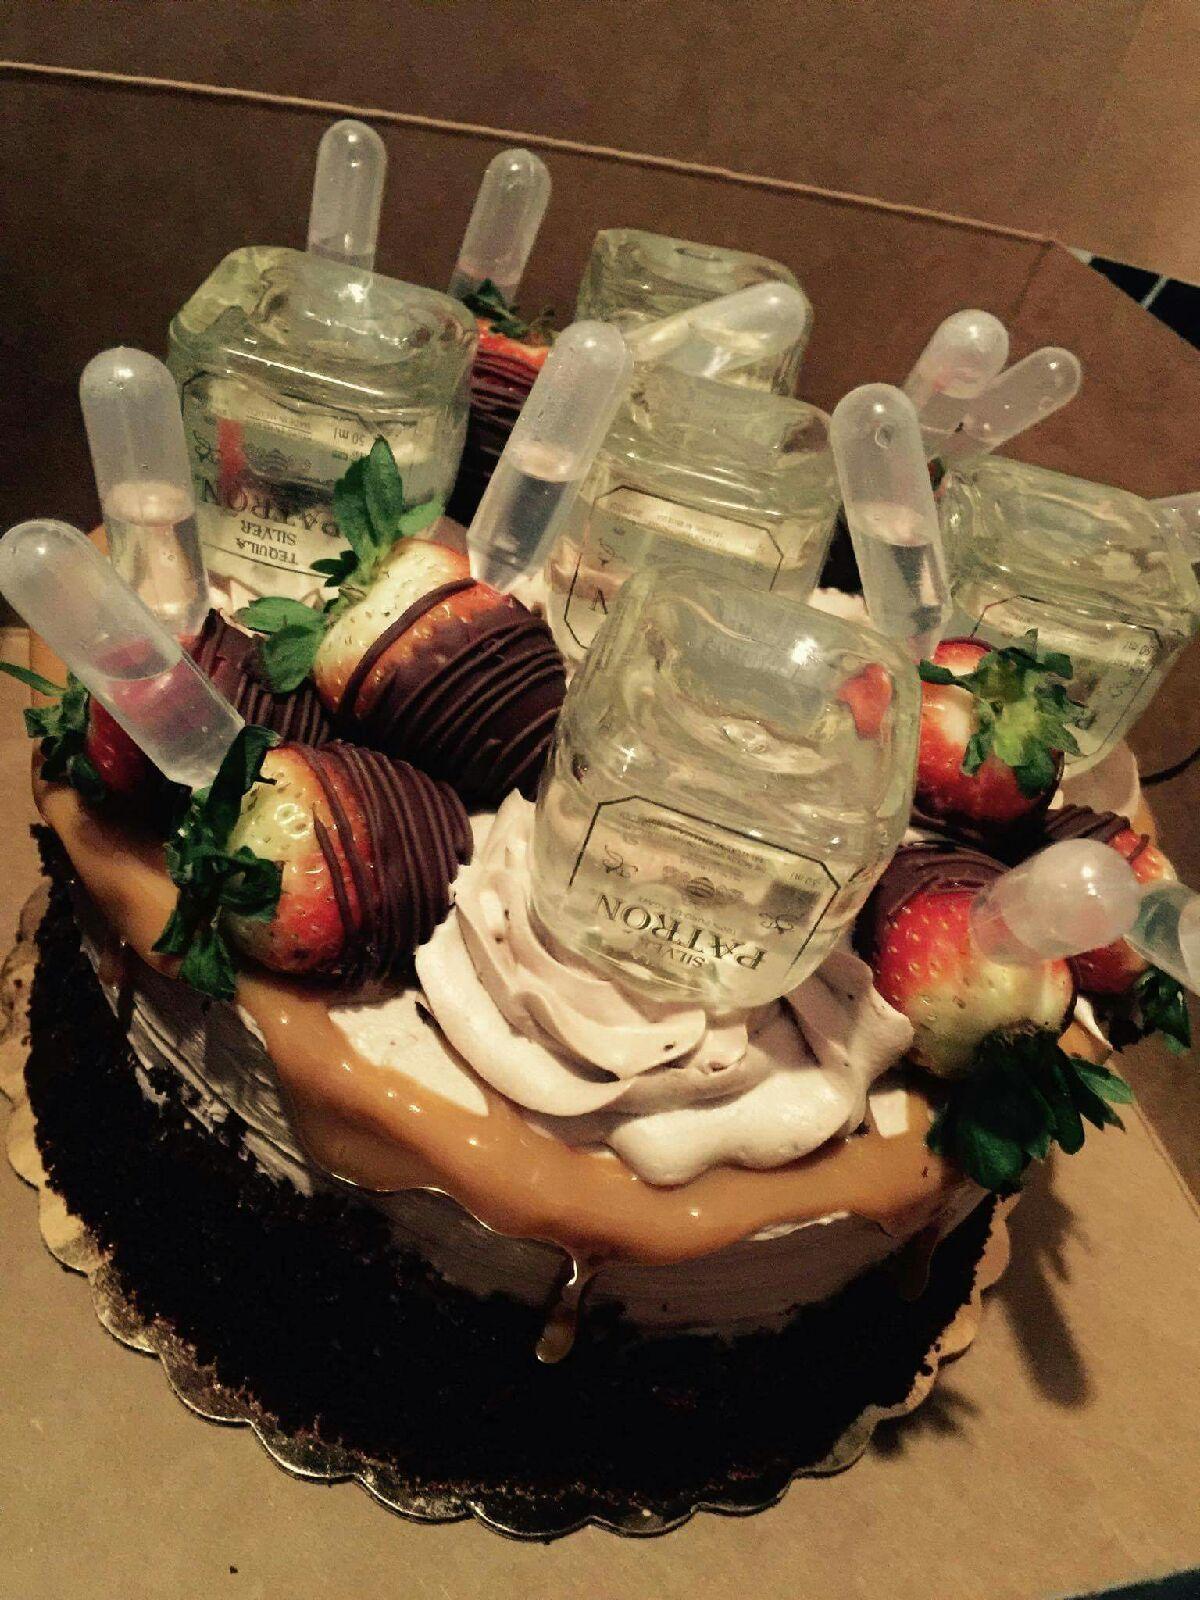 Patron Infused Cake Monaylizz Celebr 229 Tion 207 Nspir 229 Tion